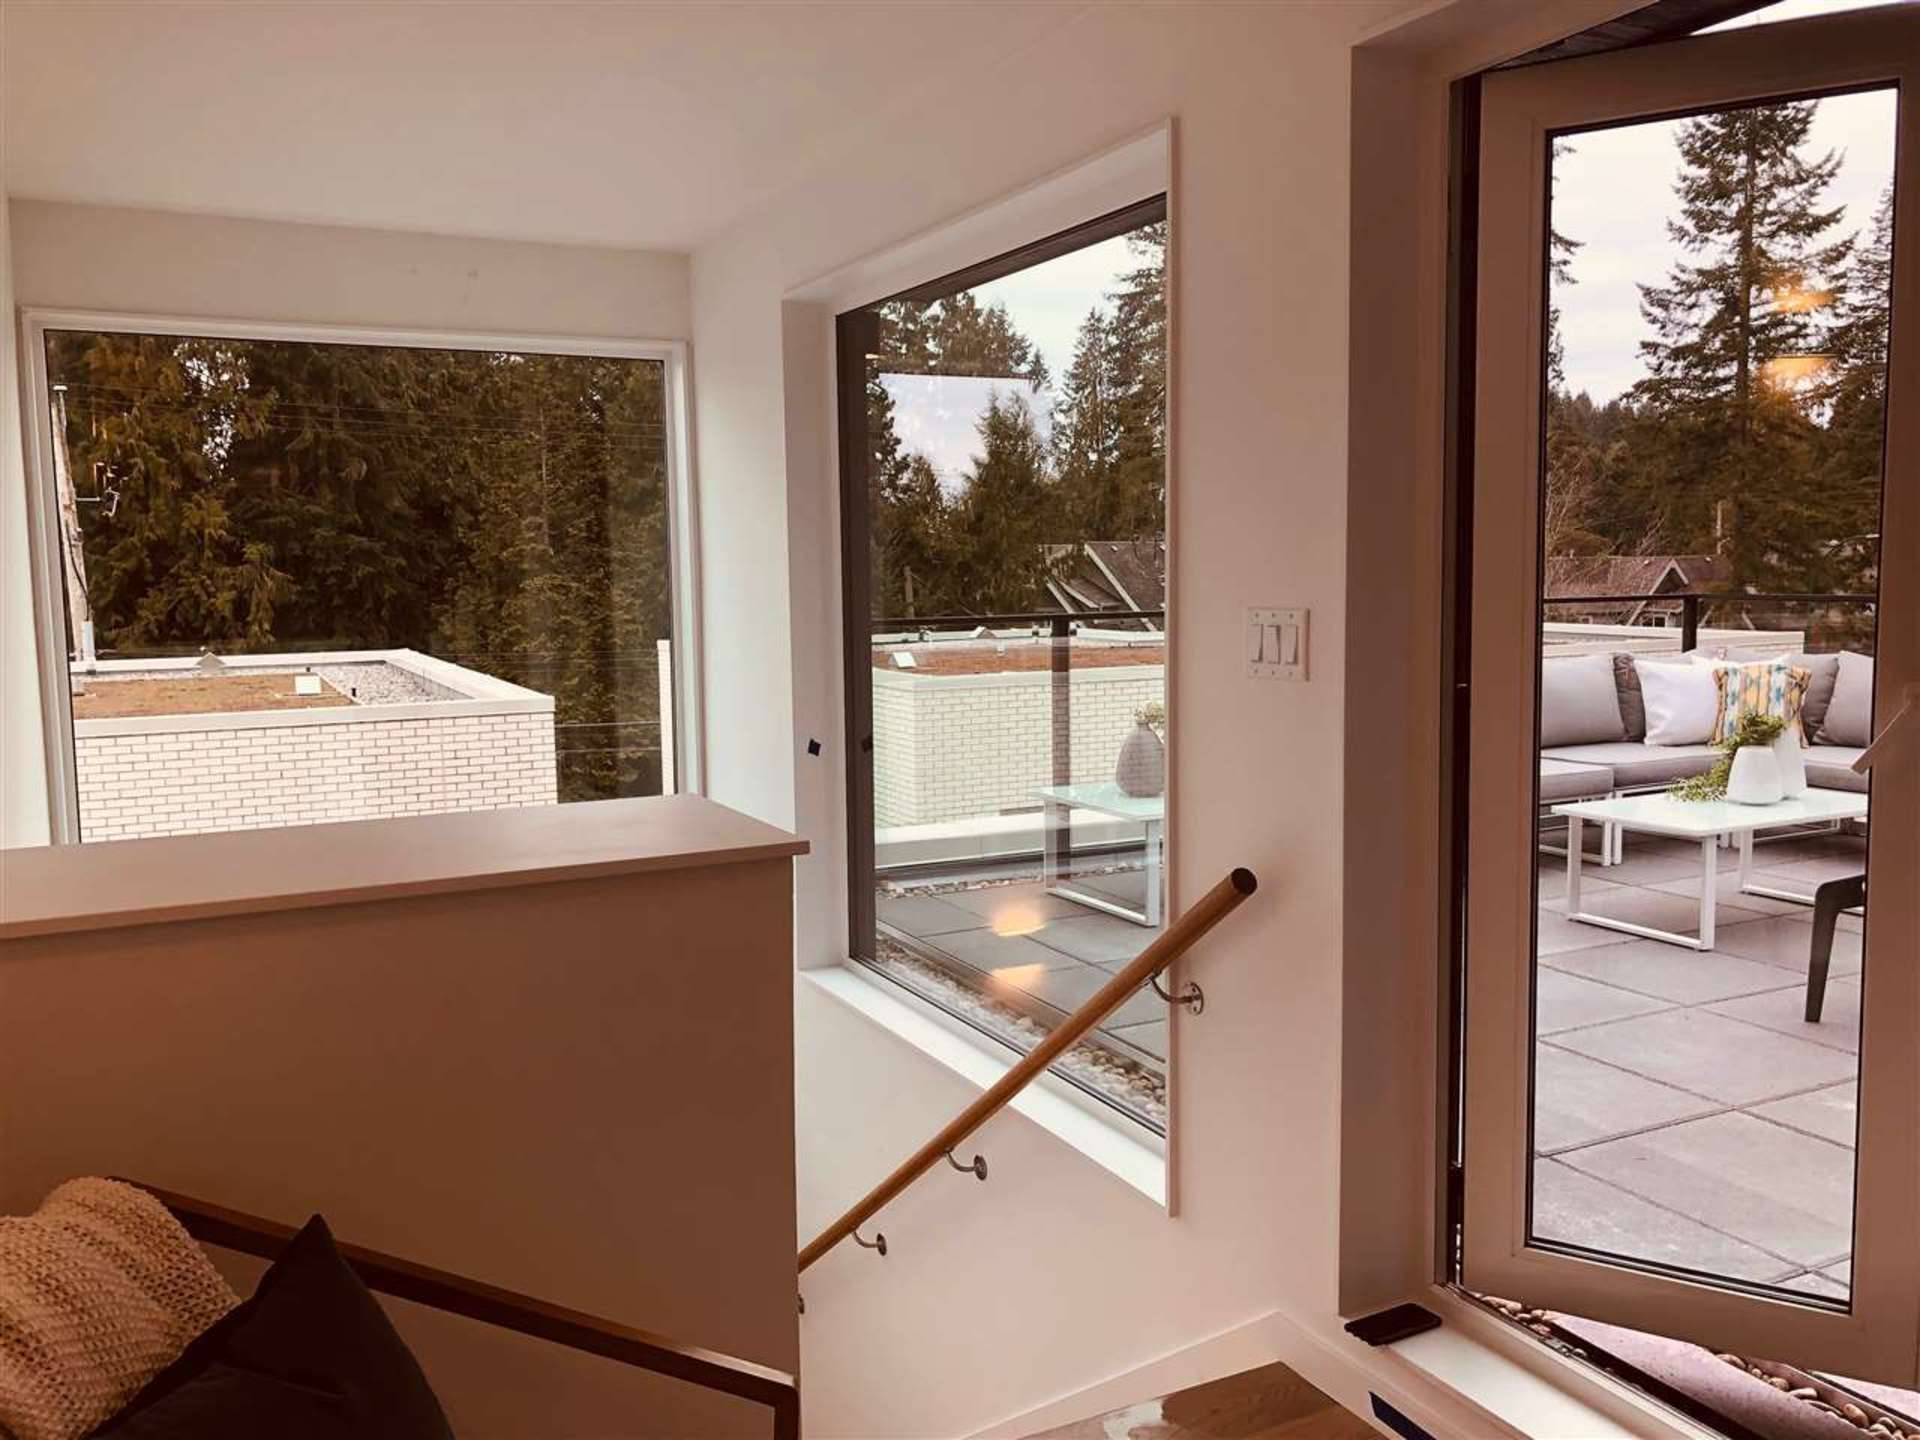 3730-edgemont-boulevard-edgemont-north-vancouver-16 at 5 - 3730 Edgemont Boulevard, Edgemont, North Vancouver